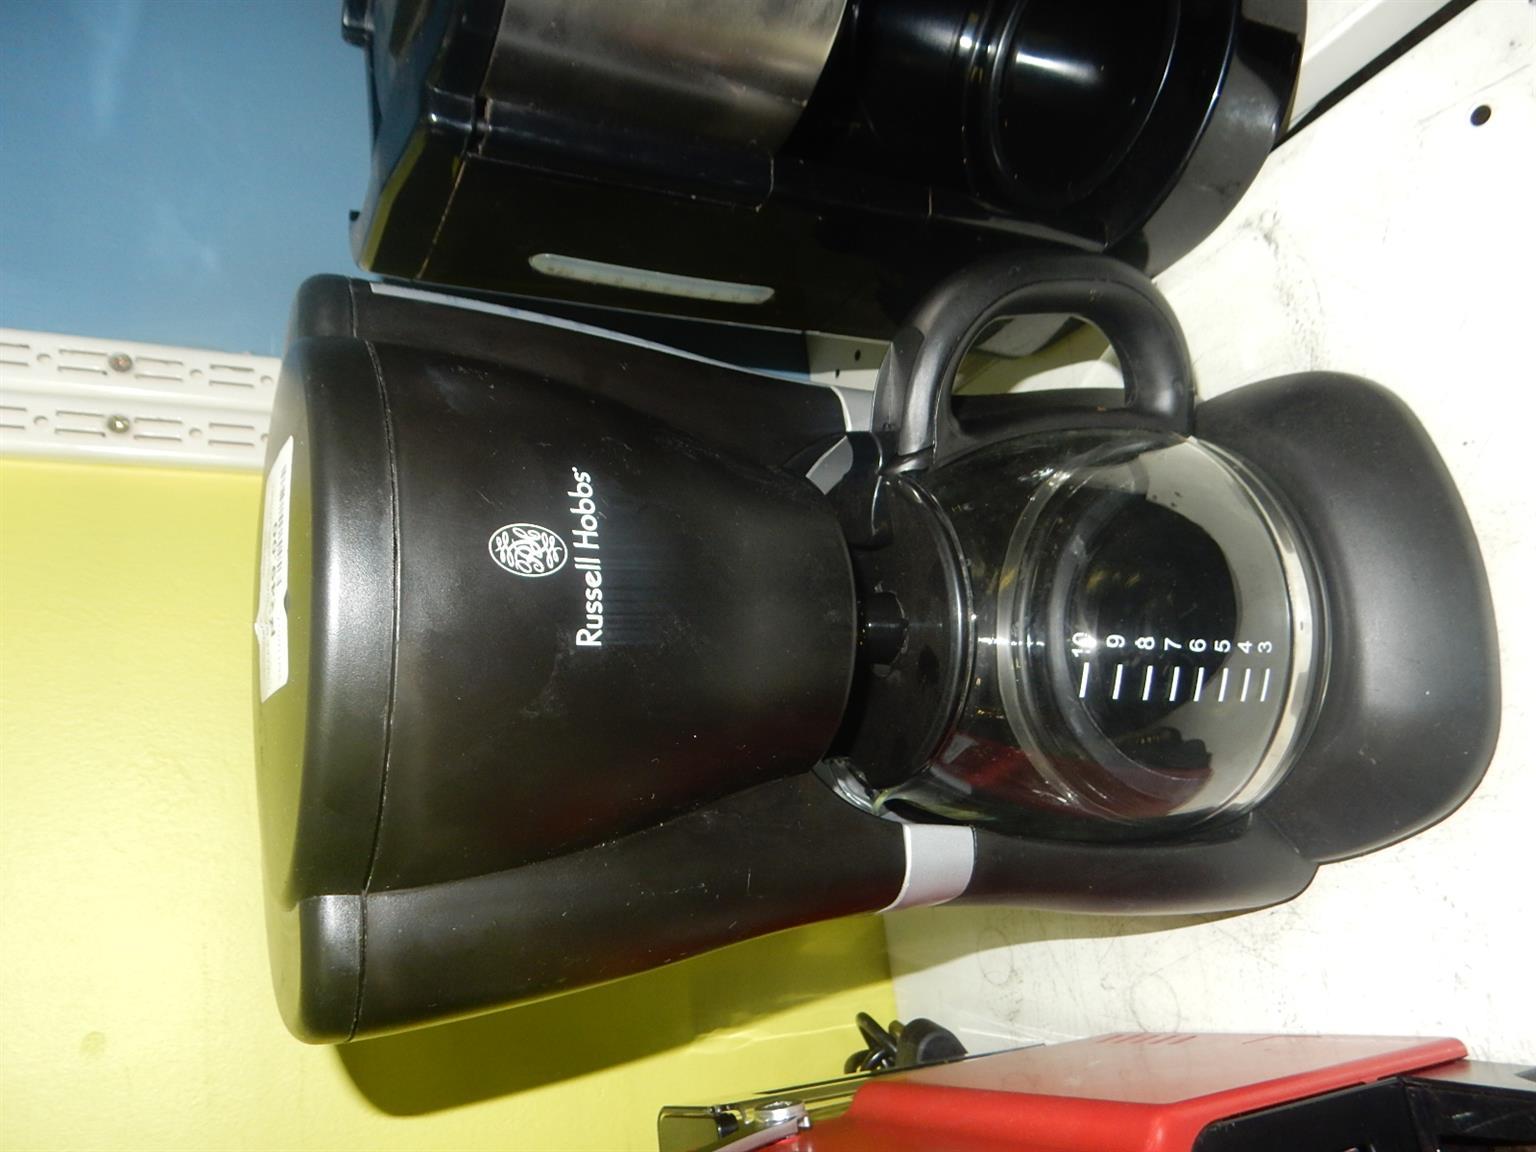 Coffee Machine - Russel Hobbs